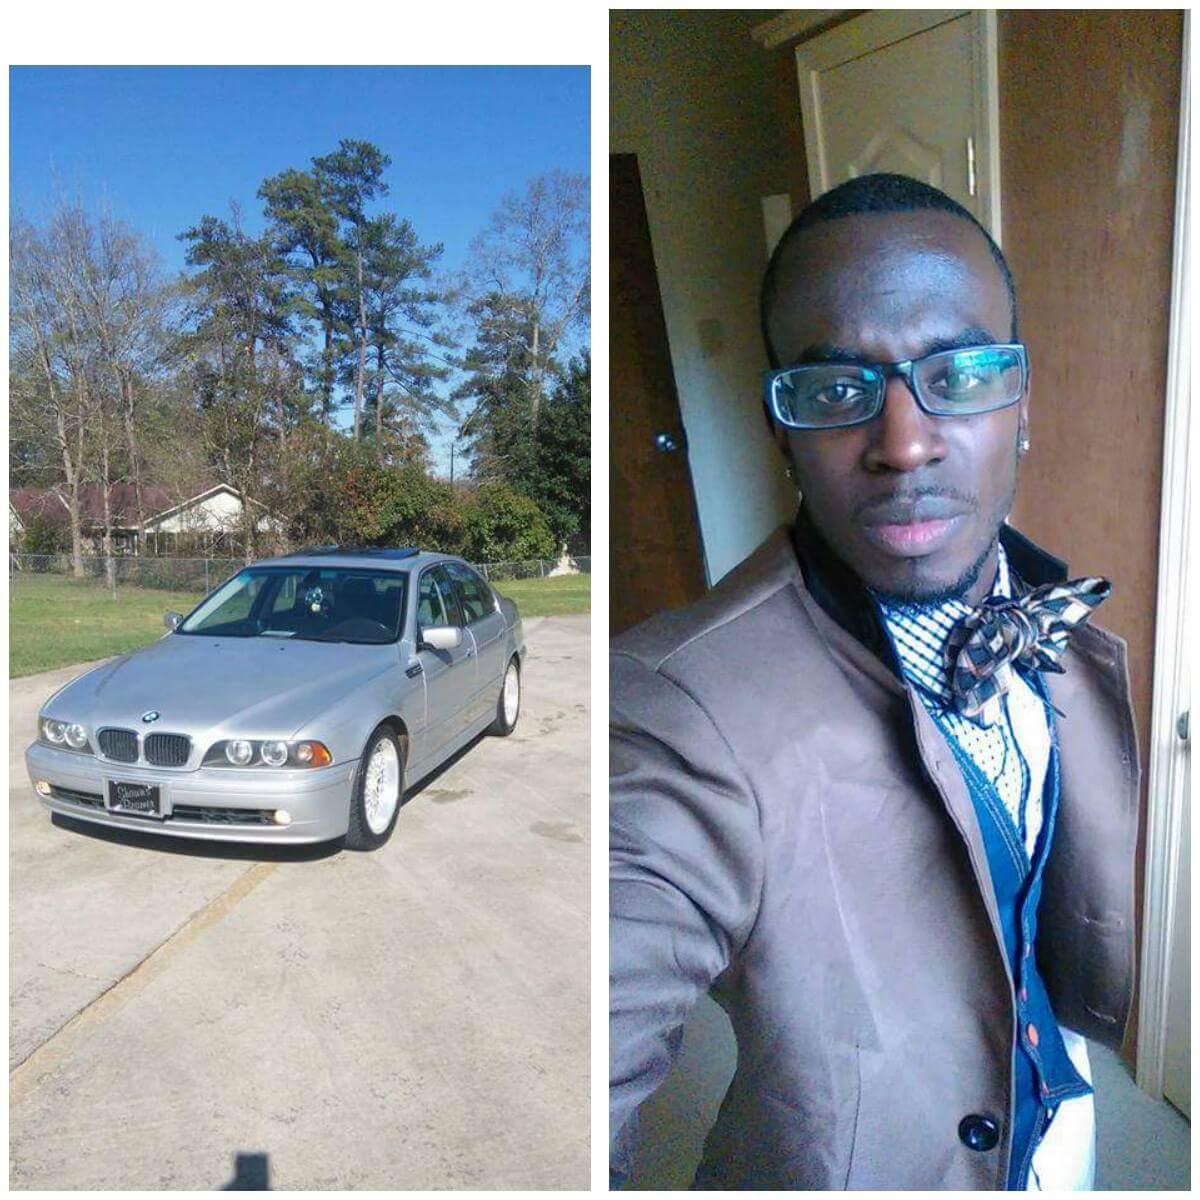 Alabama wilcox county camden - Missing Man S Car Found In Wilcox County